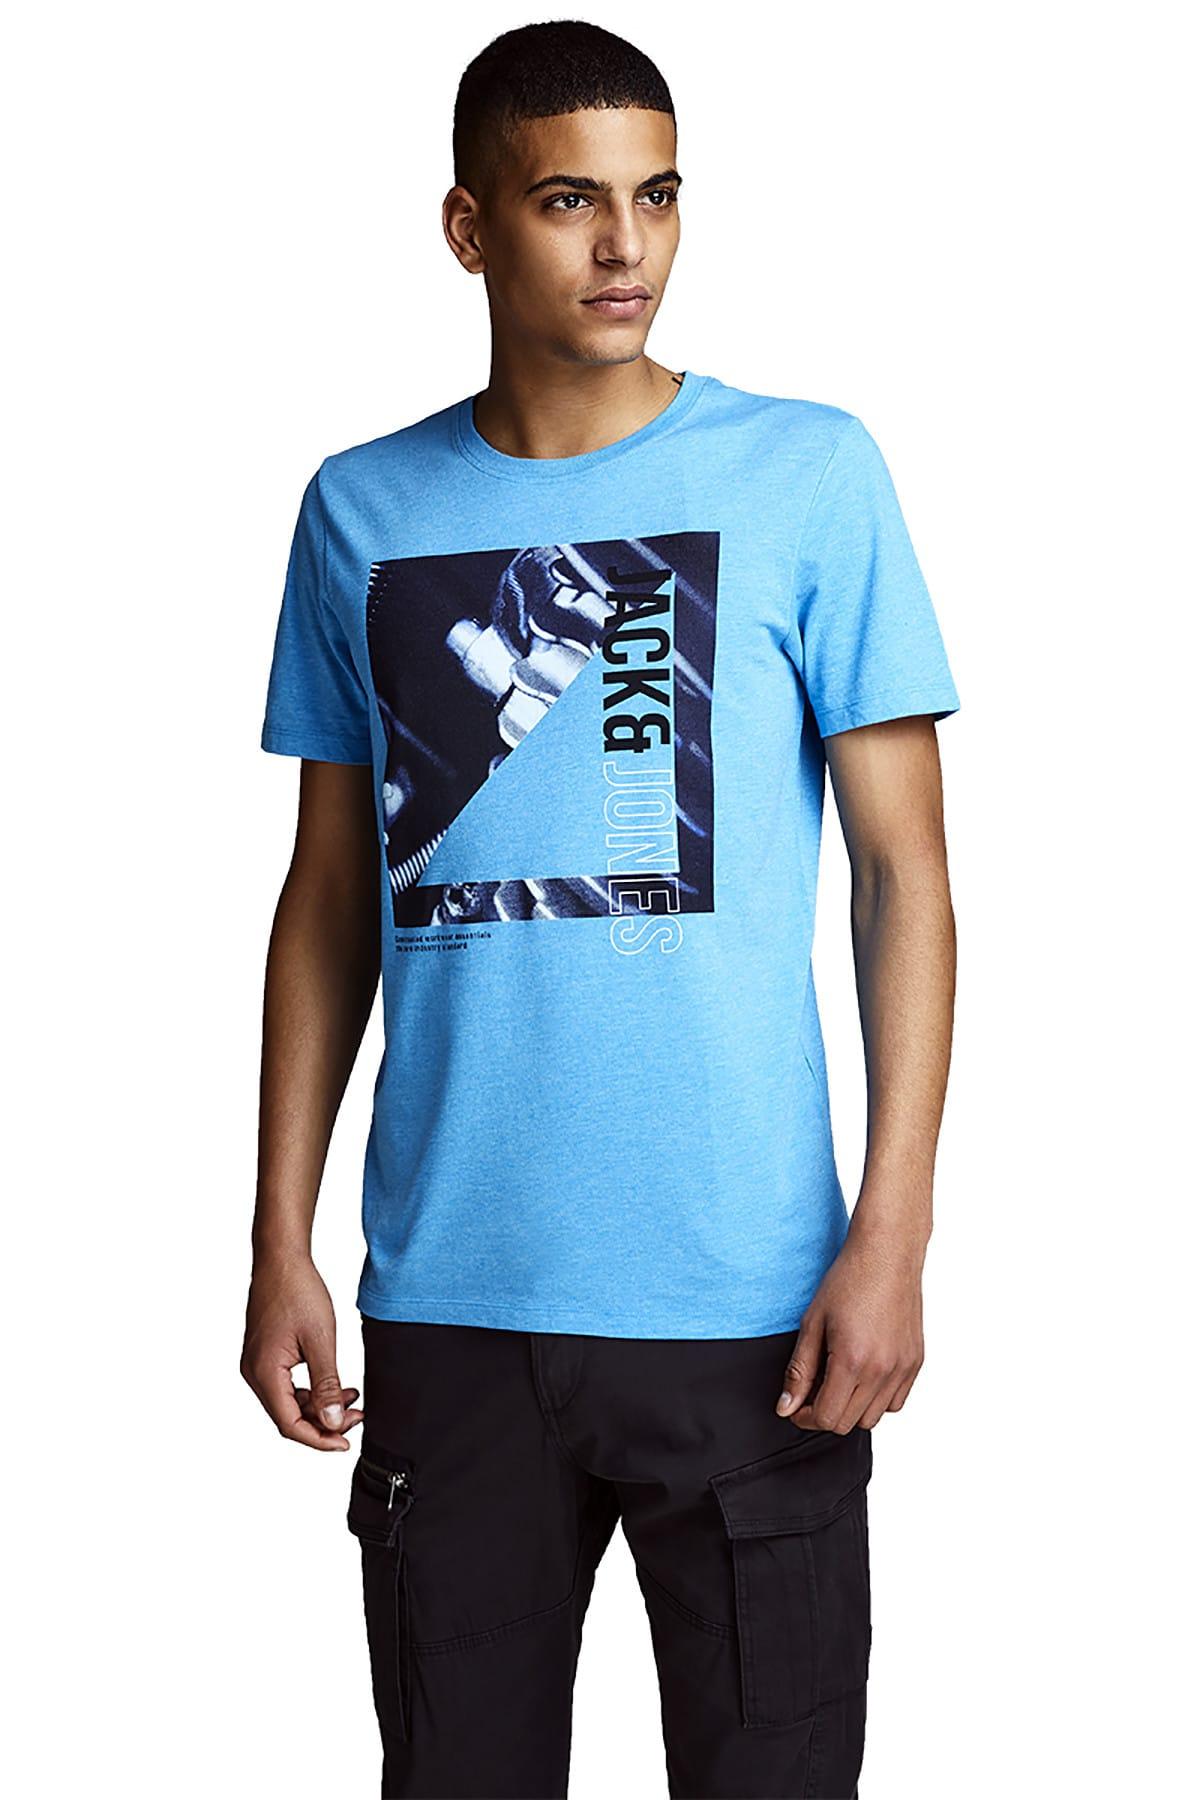 Jack & Jones T-shirt - Spring-Fell Core Tee 12146172 1